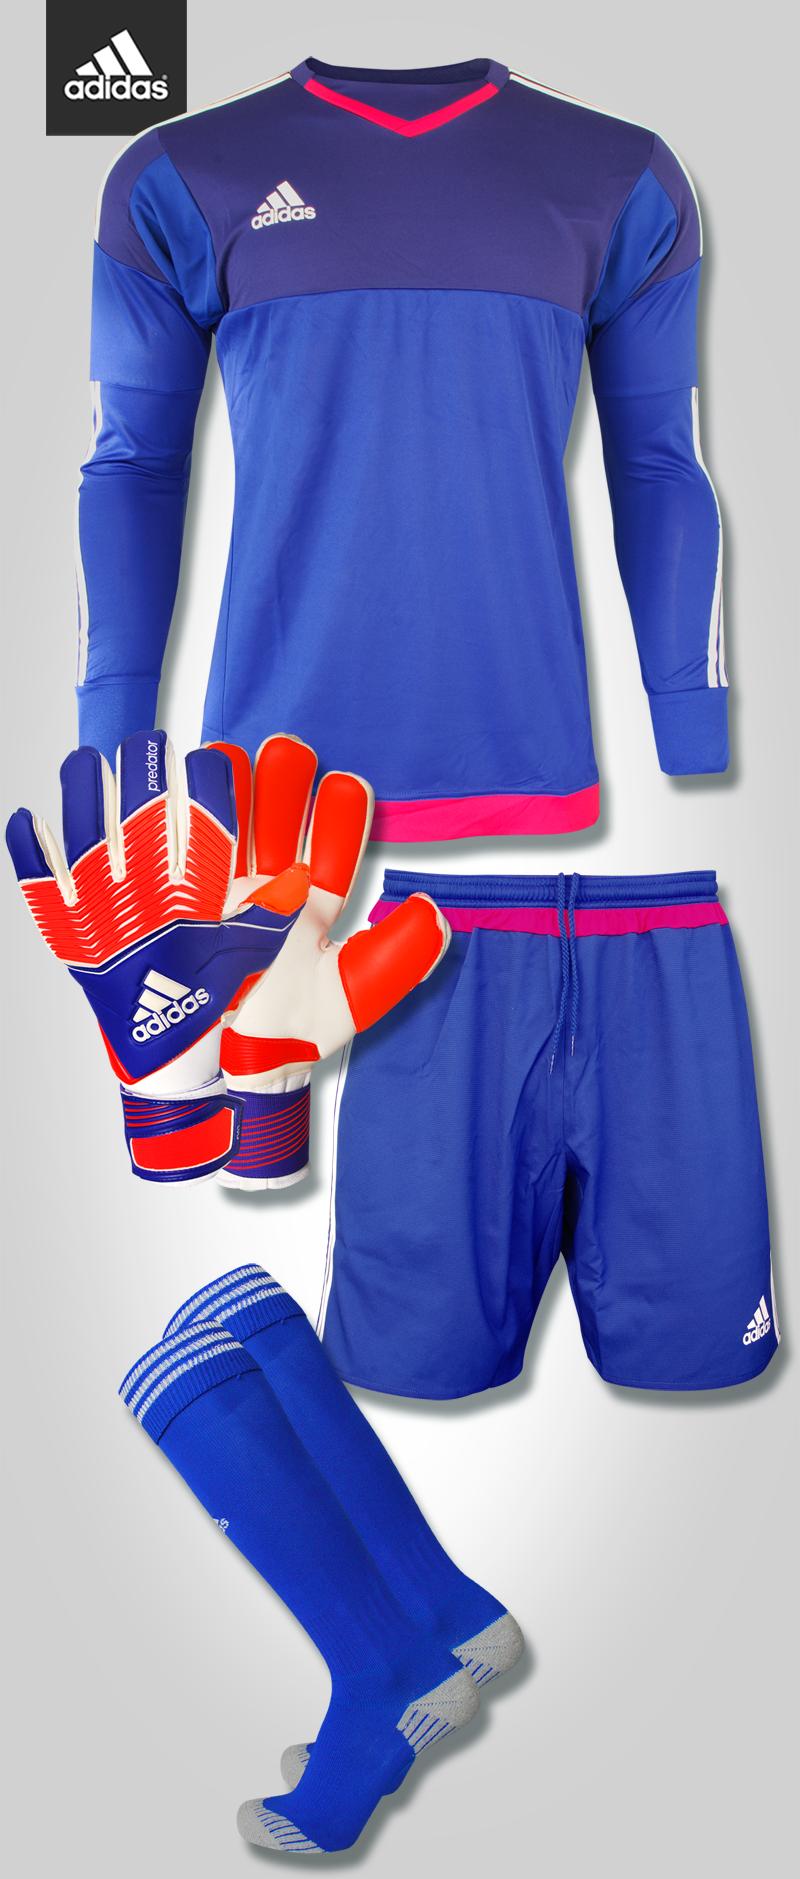 Goalkeeper Set Adidas Top 15 Completo per portieri Guantes De Portero  Adidas 6bfb023aba0